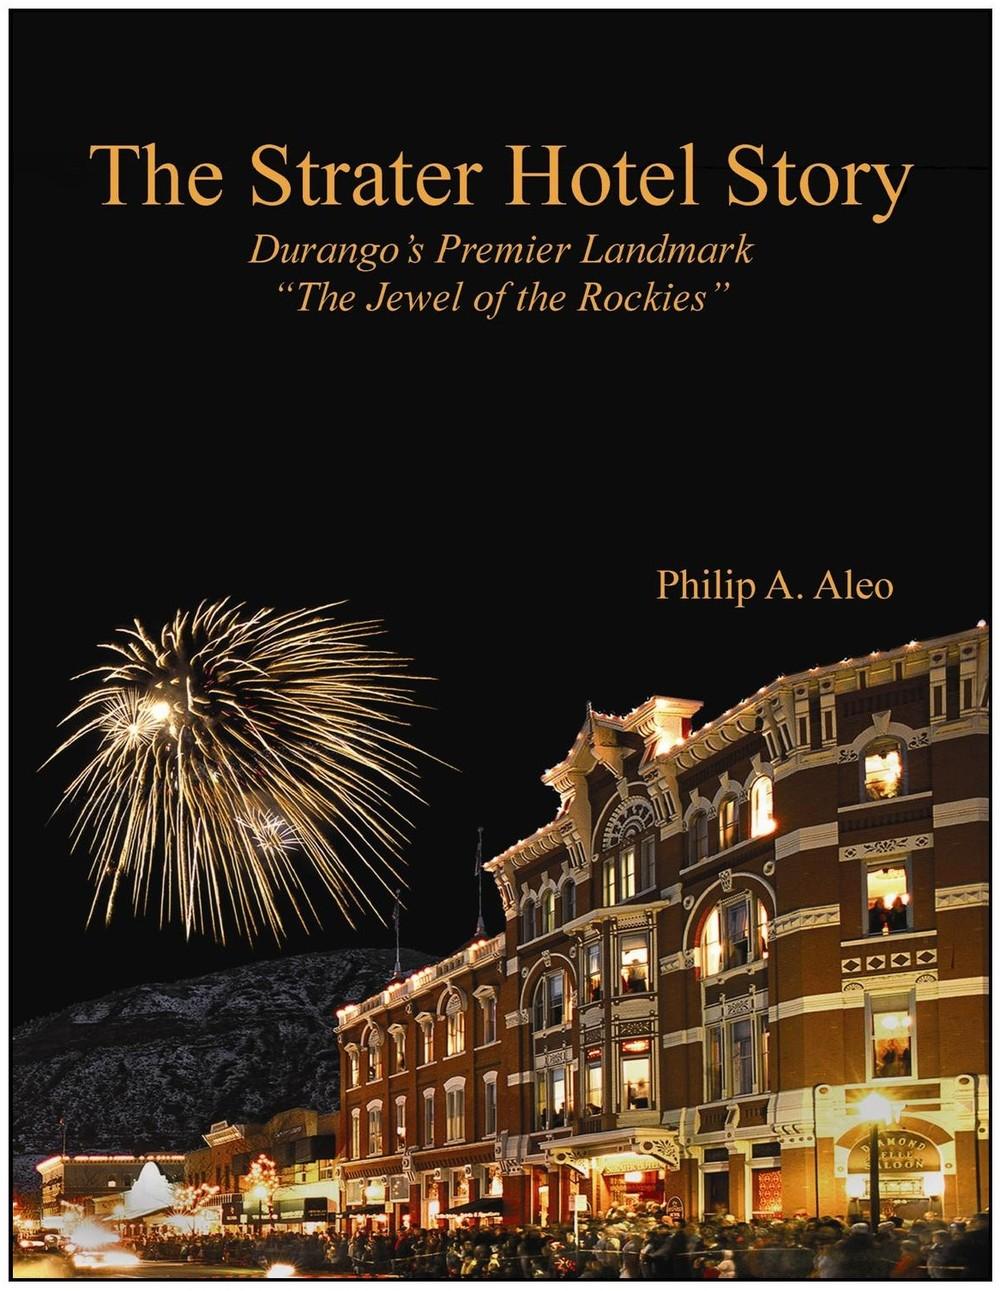 Strater Hotel Story.jpg